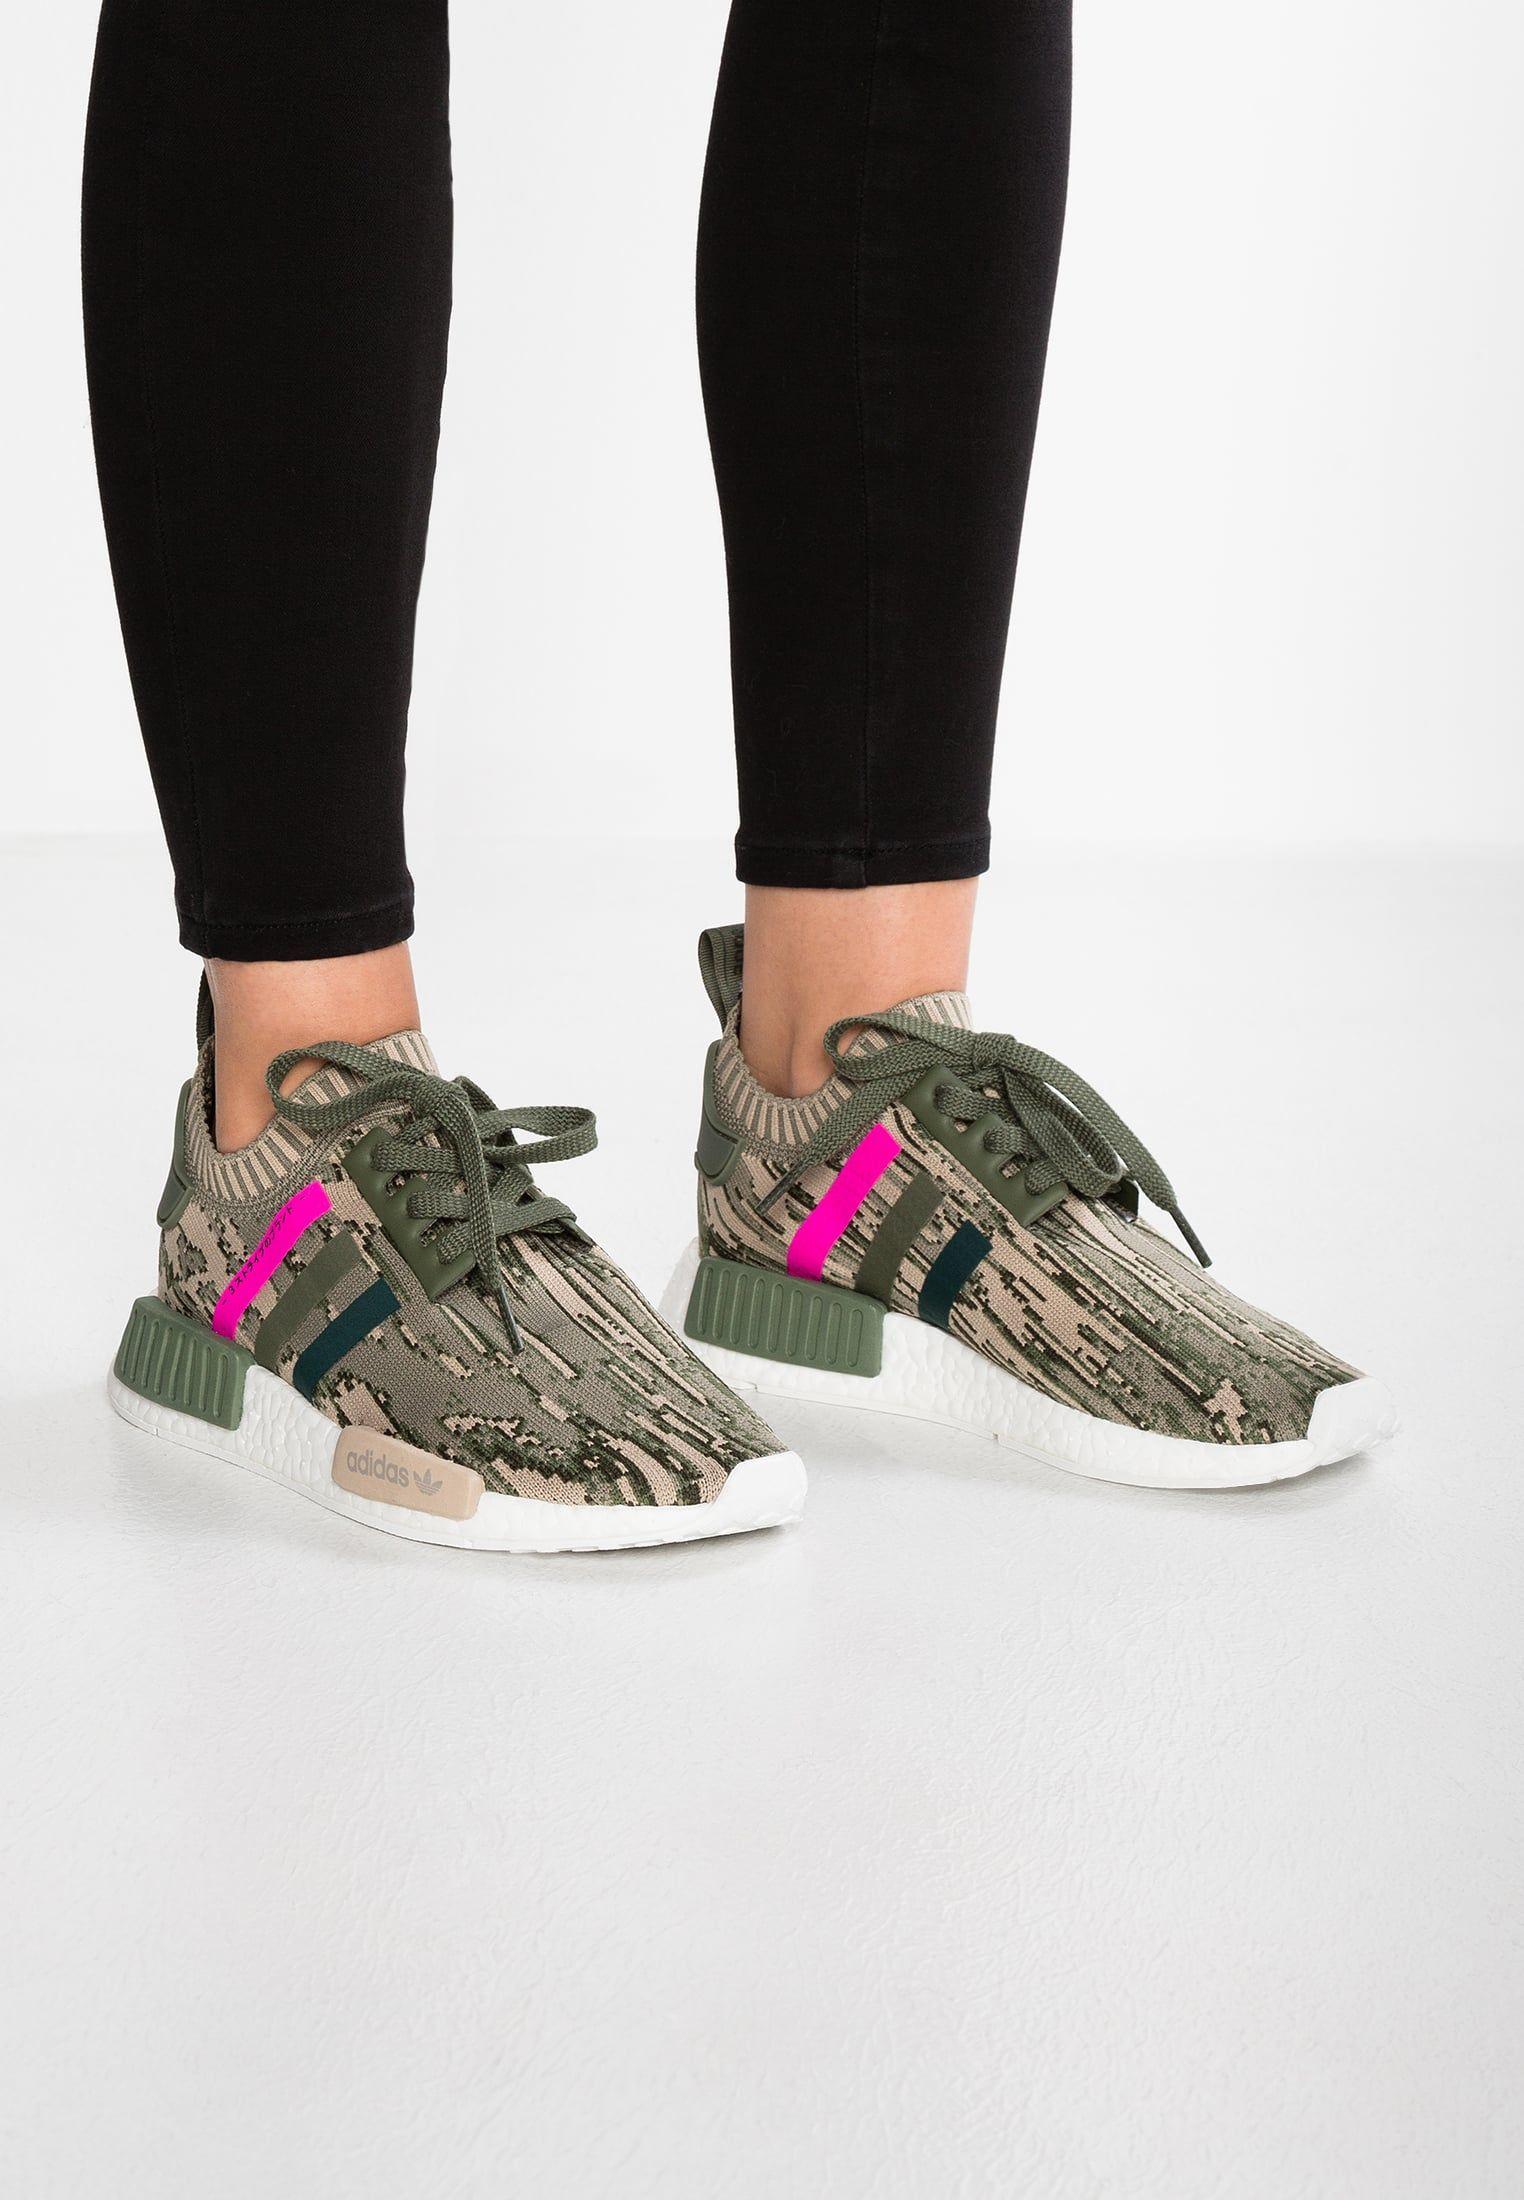 1c8a66d31 adidas Originals NMD R1 PK - Sneakers laag - st major green night shock pink